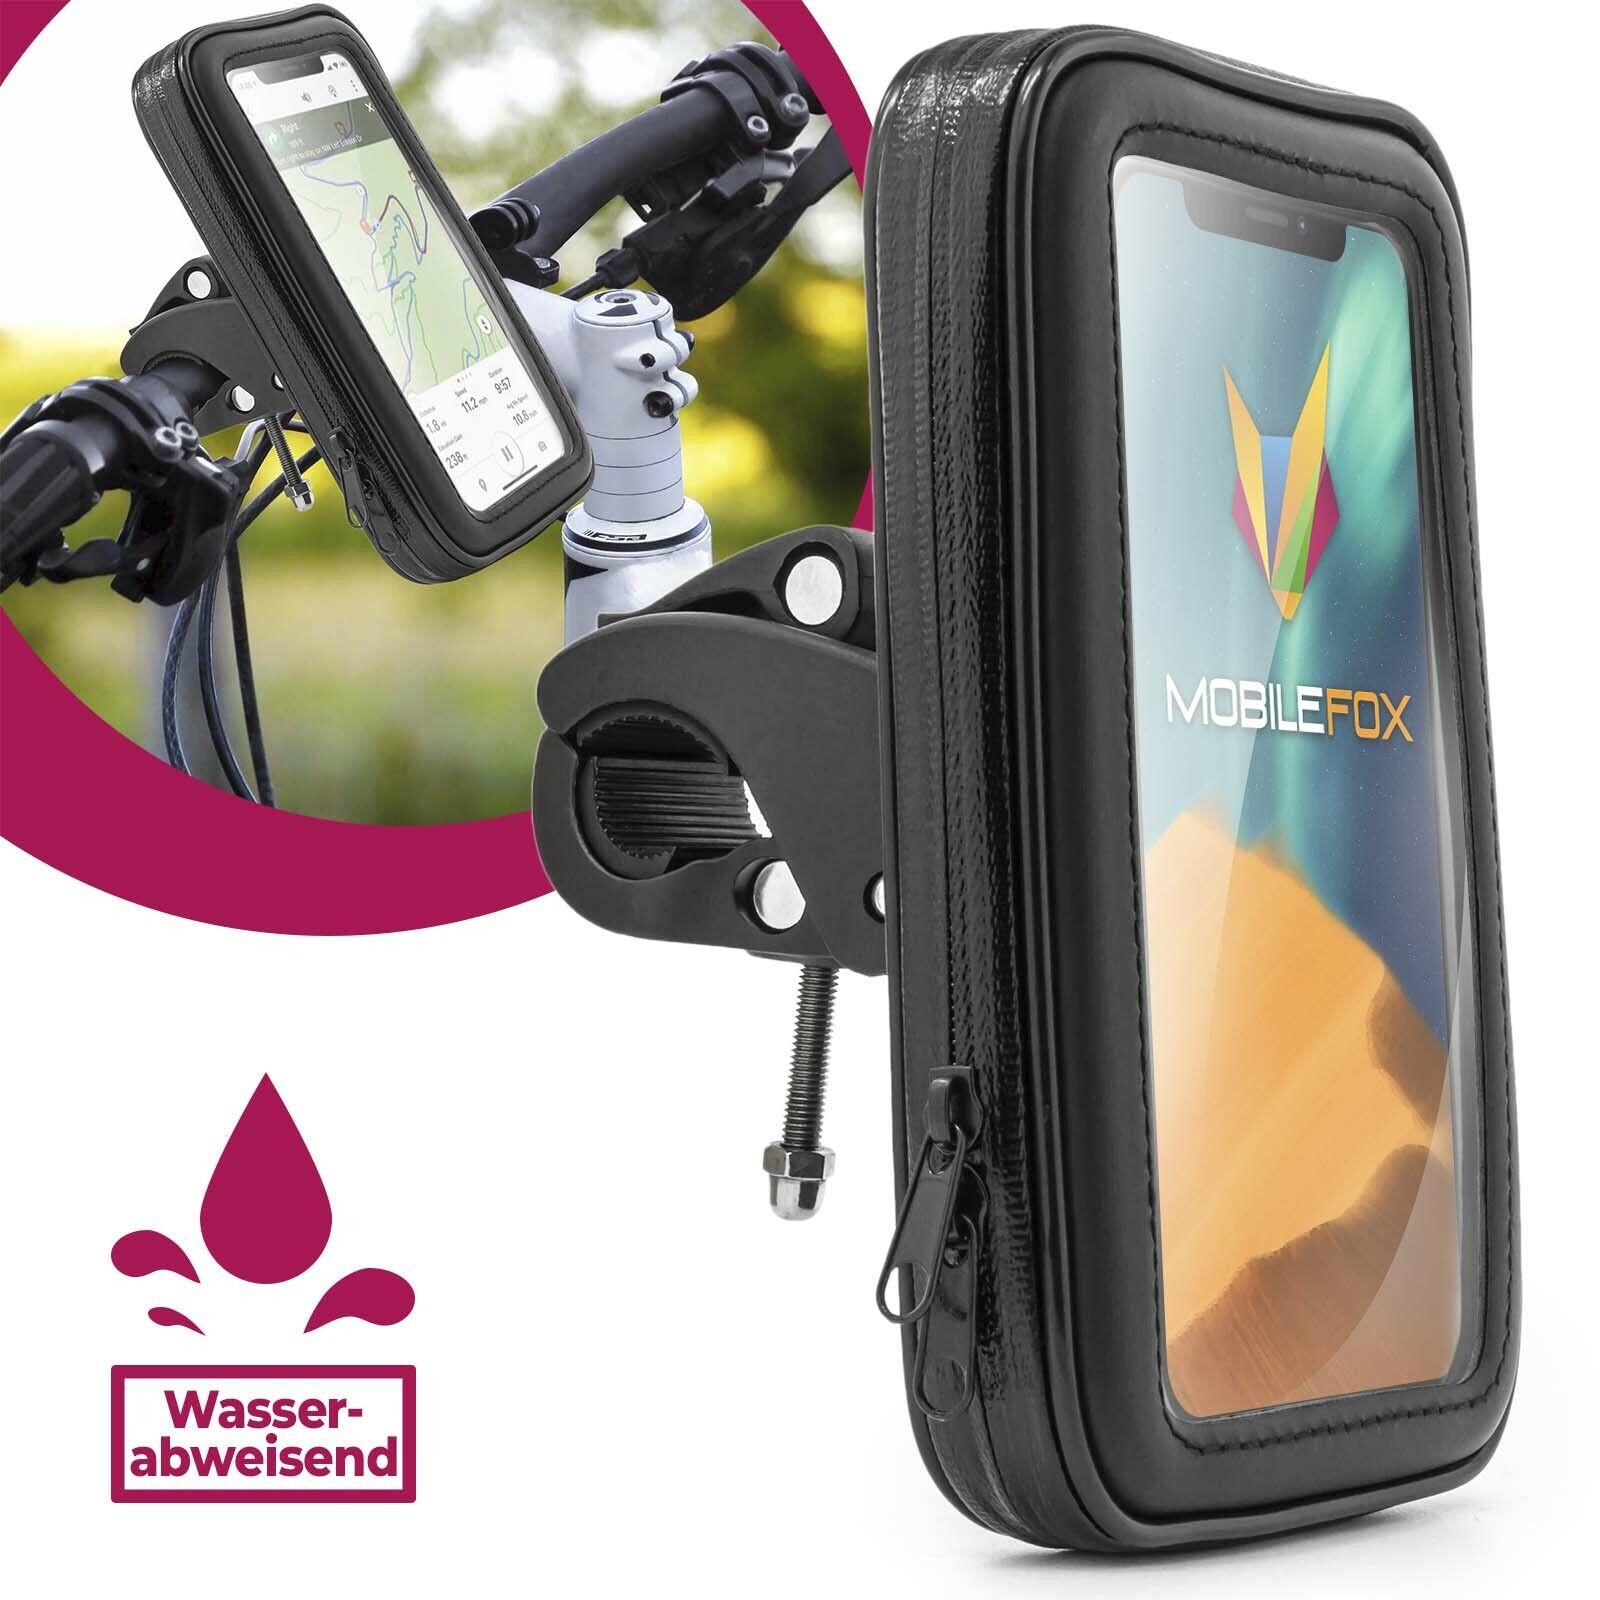 Halterung Halter Fahrrad Motorrad Lenker Handy Tasche für Apple iPhone 8 7 6 S